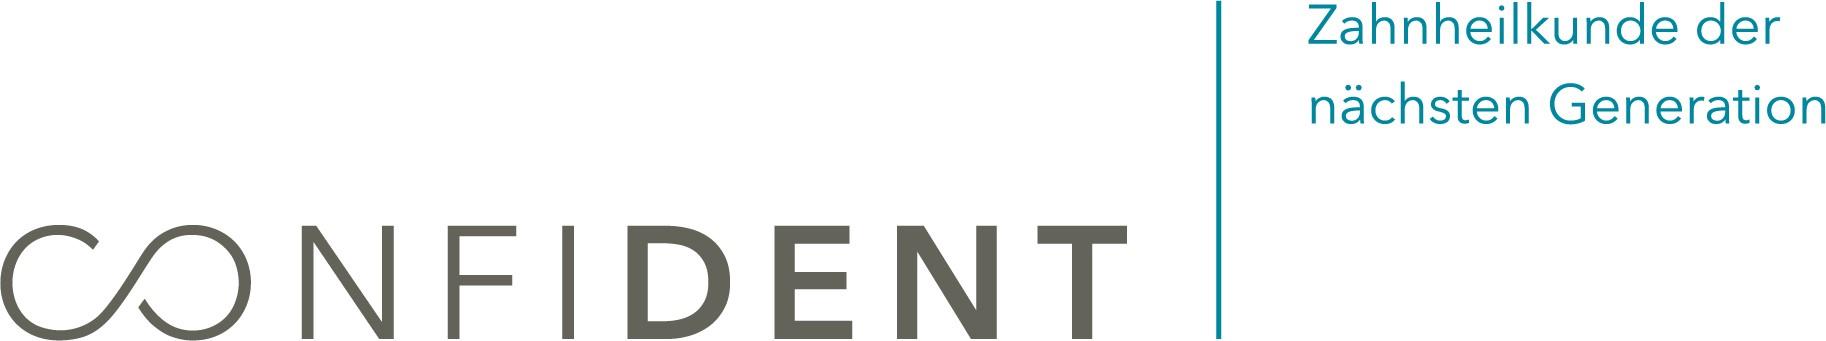 Logo Zahnarztpraxis confident Esslingen